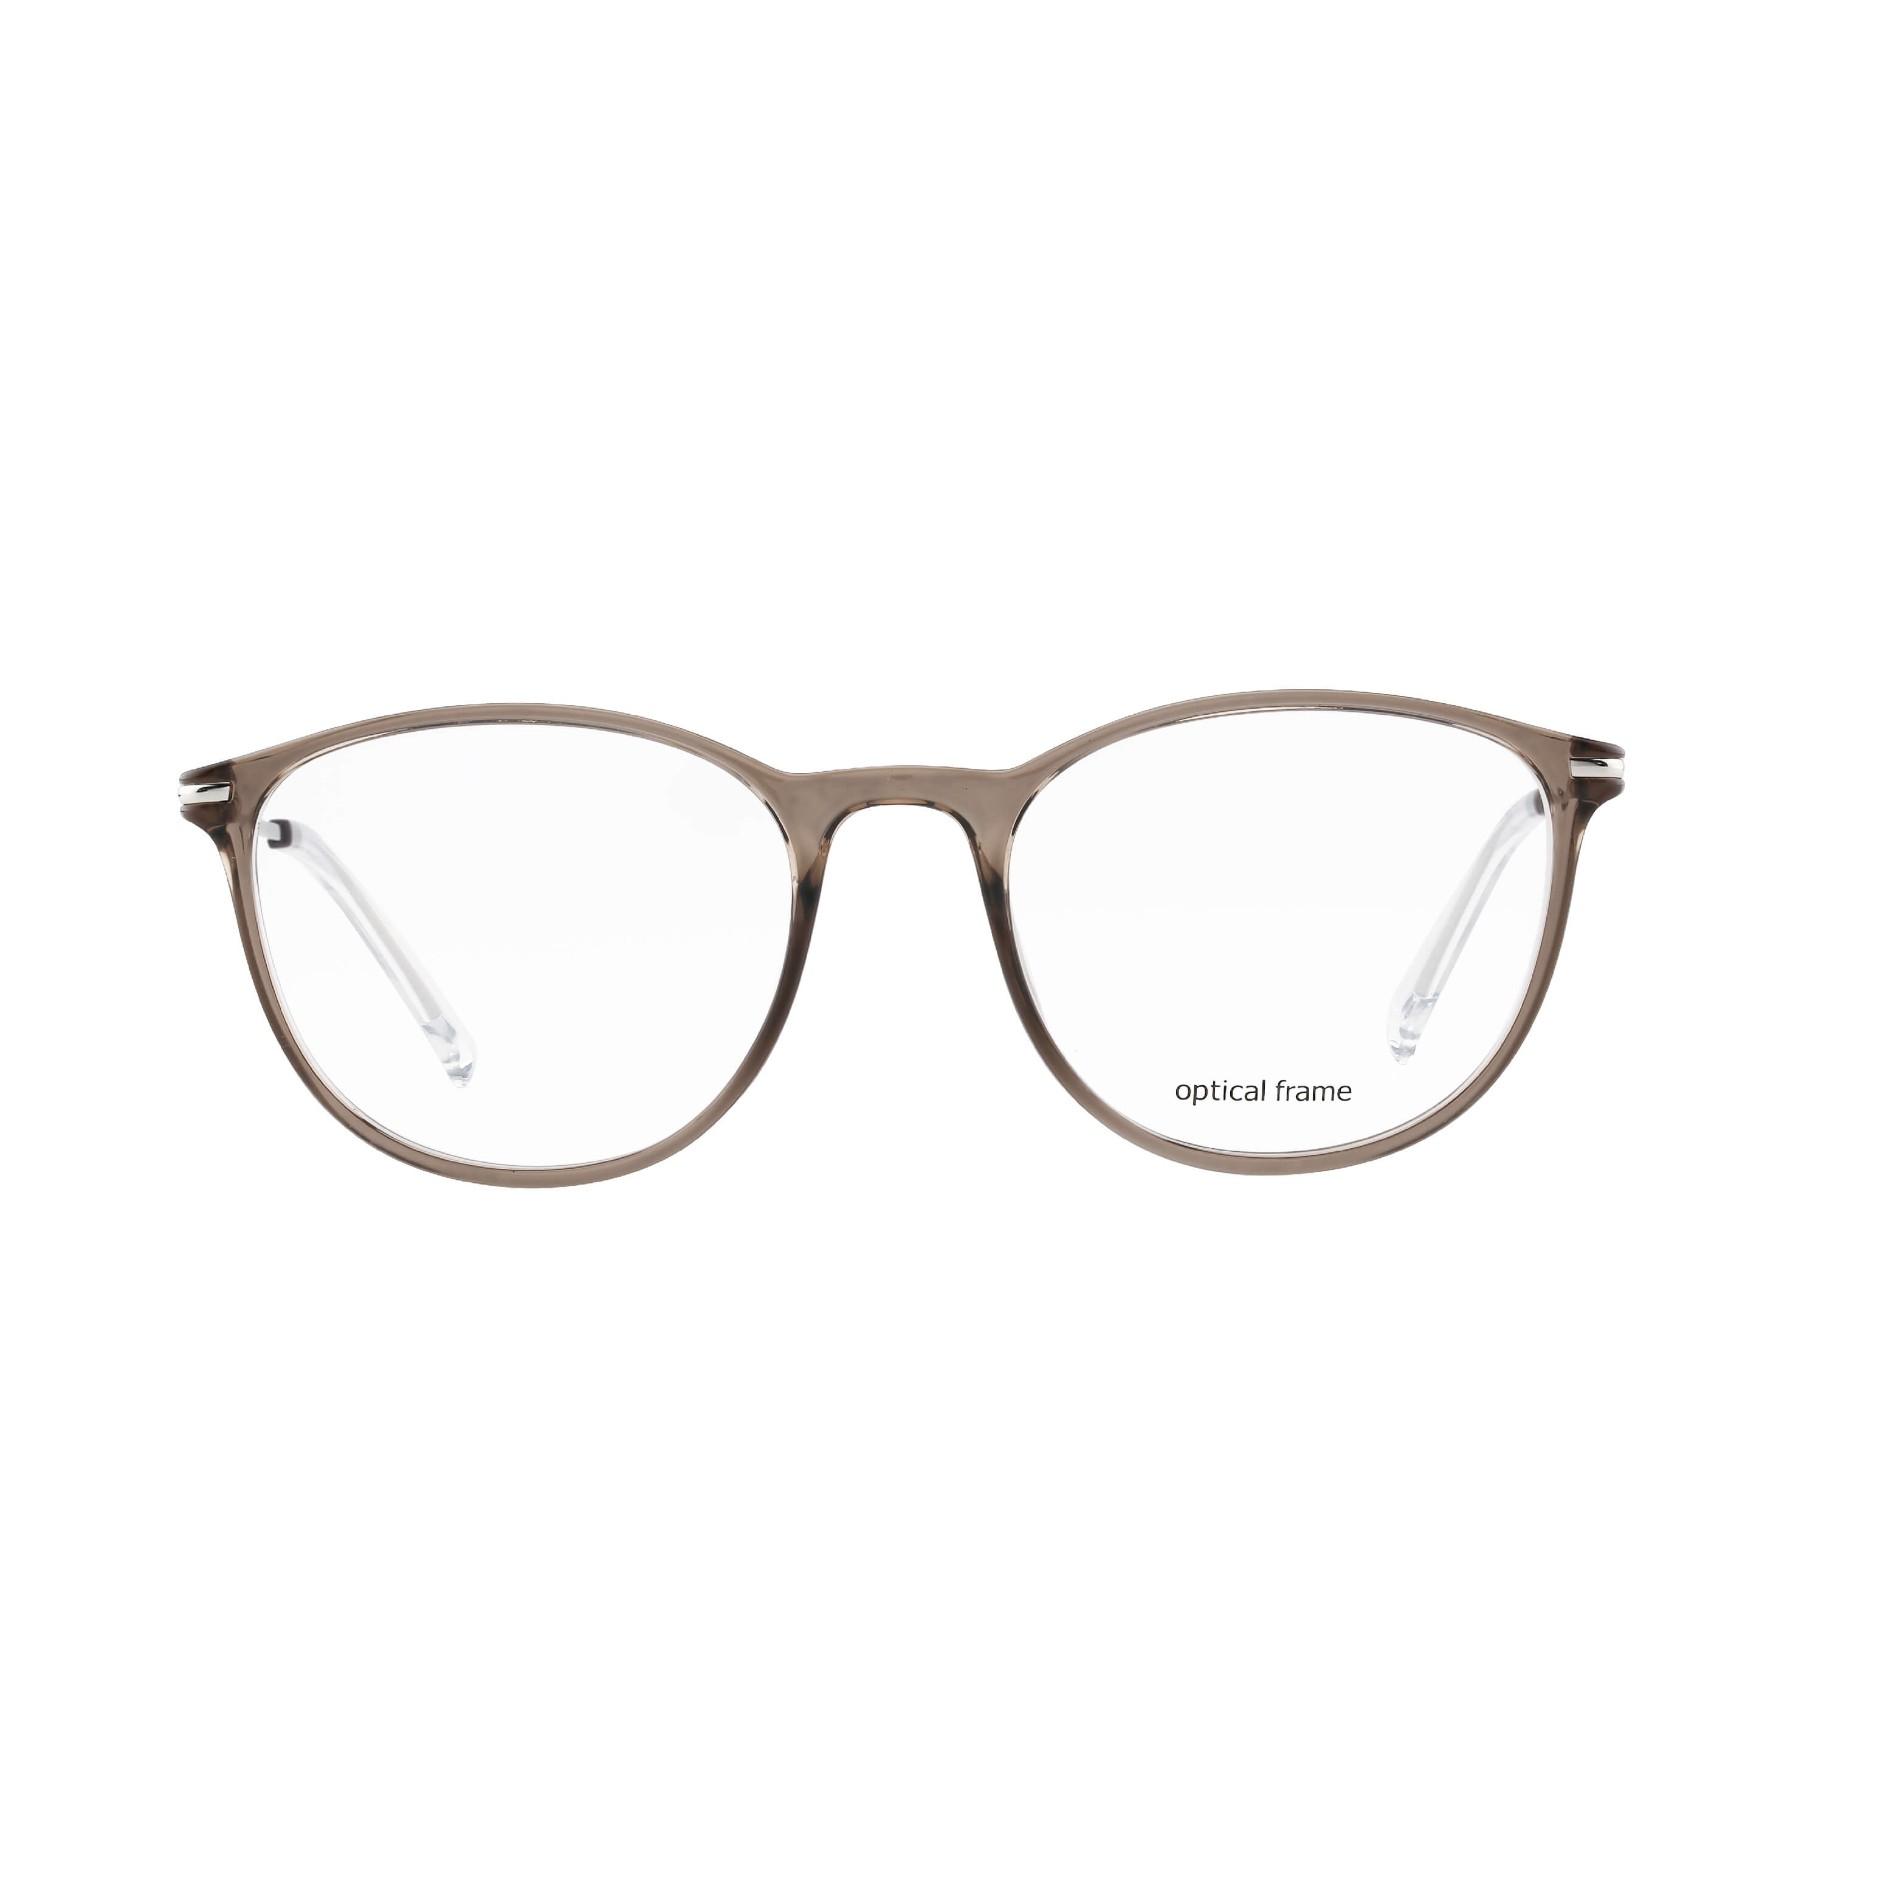 High Quality Unisex TR90 Optical Frames Manufacturers, High Quality Unisex TR90 Optical Frames Factory, Supply High Quality Unisex TR90 Optical Frames